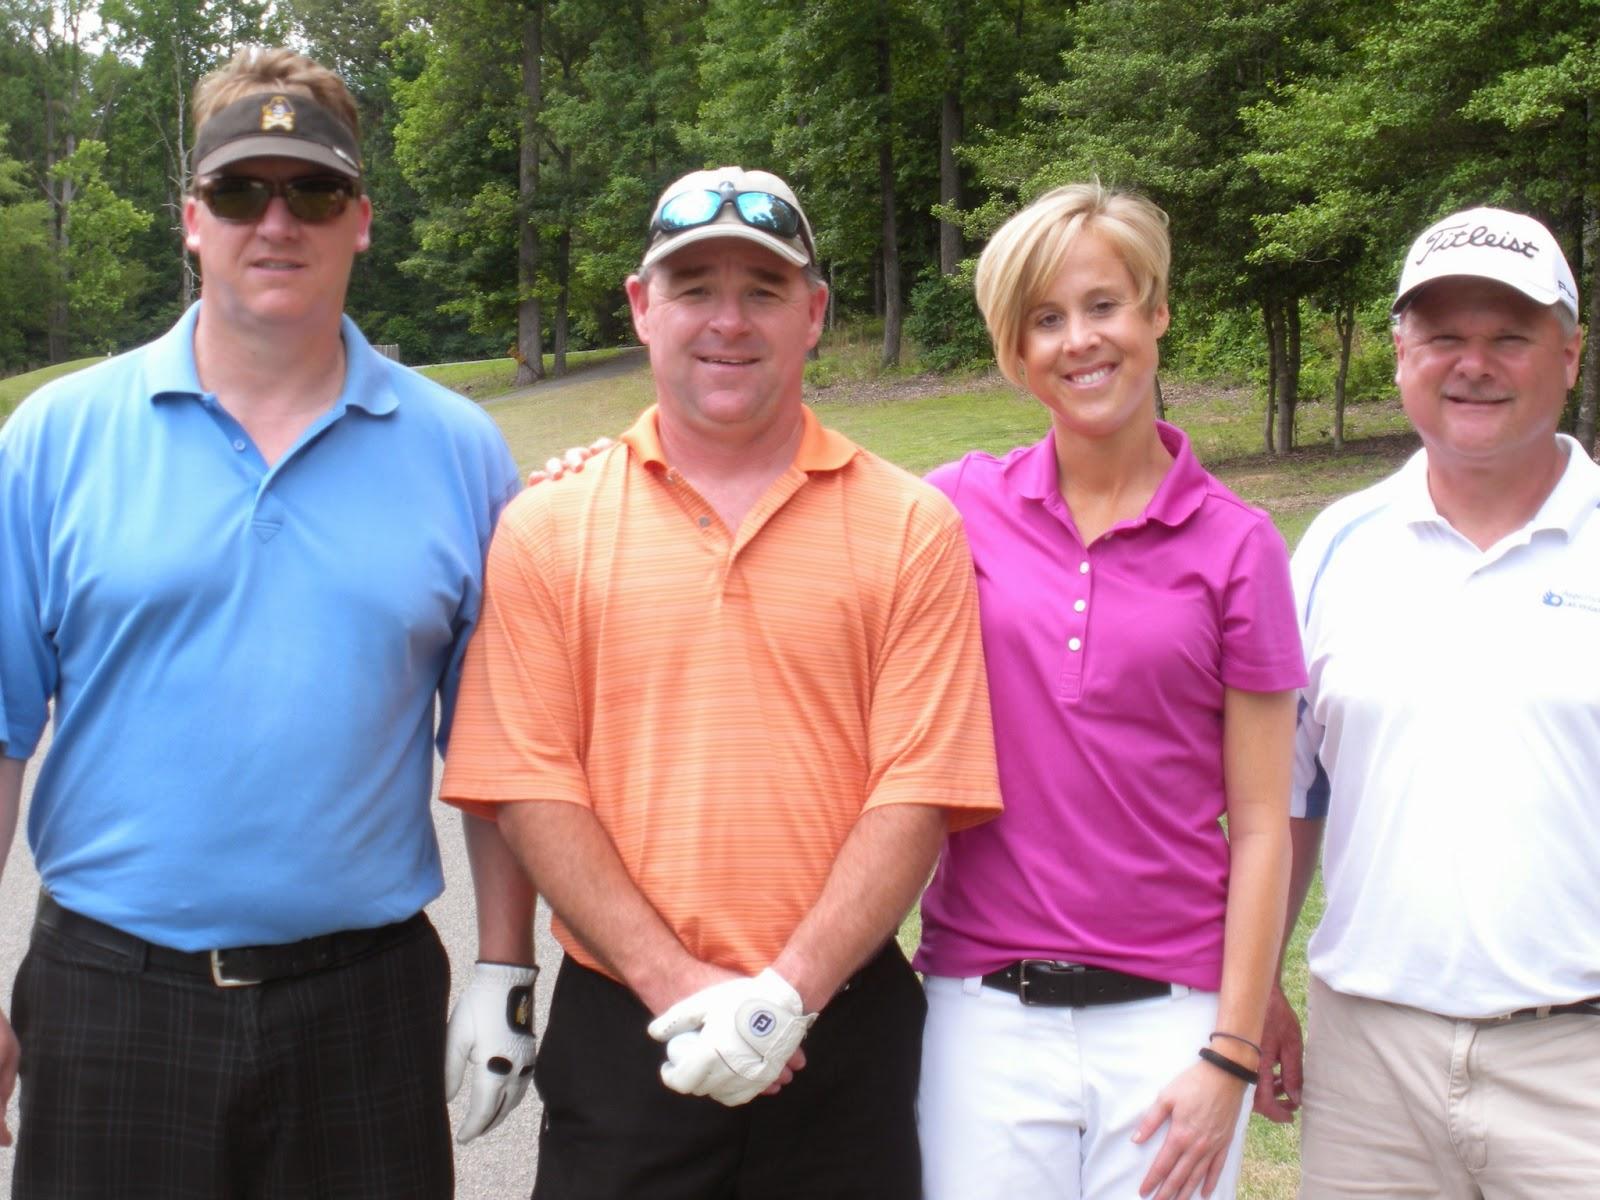 Virginia Pond's 13th Annual Charity Golf Tournament